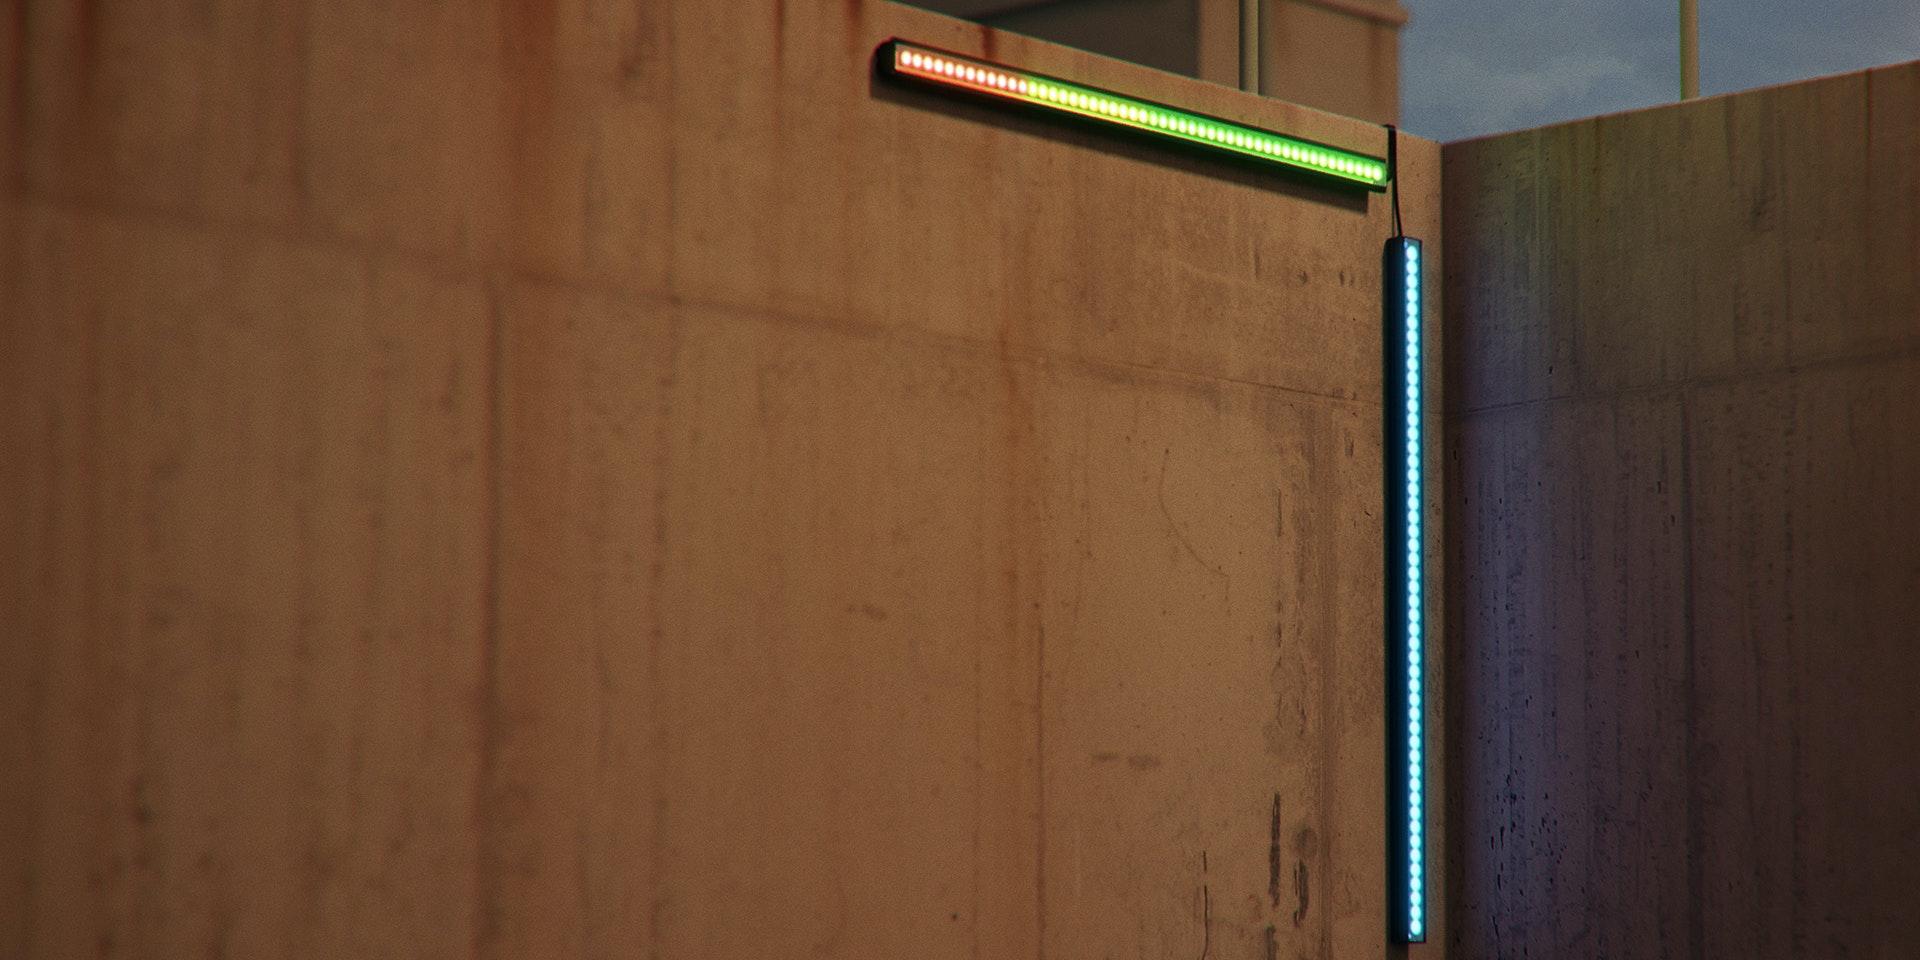 Rom Hopper Bin Indicator - Depth / Distance Indicator Light in application